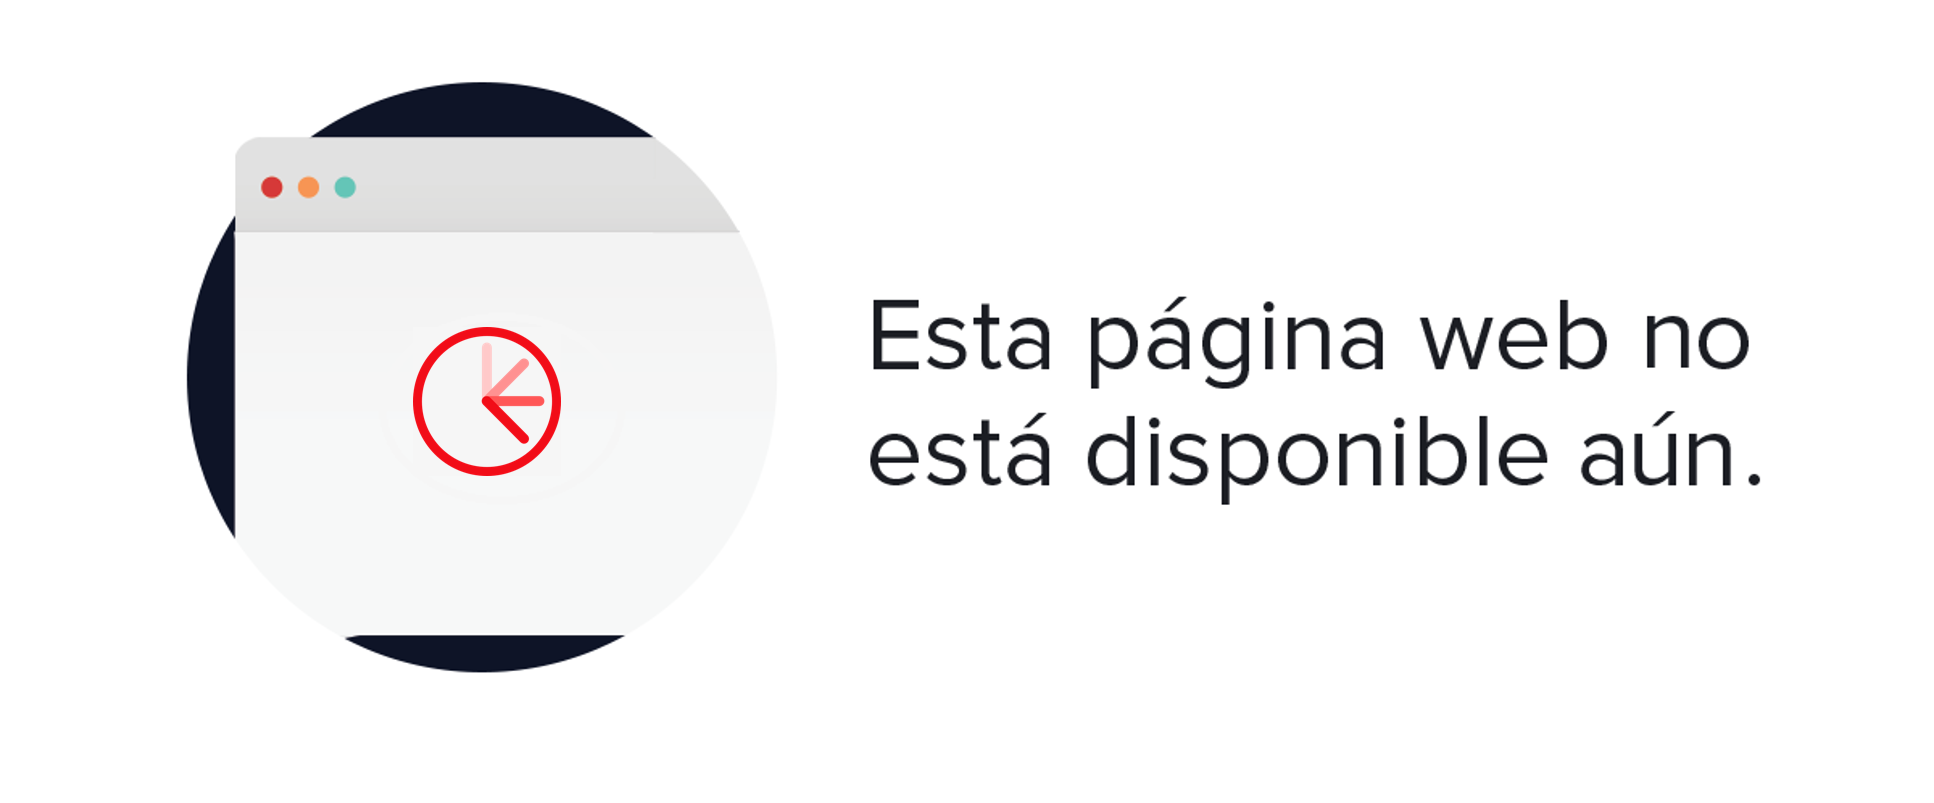 Vero Moda - Falda lápiz de mujer Vero Moda de polipiel Negro 001029364708221001 - THVVADT